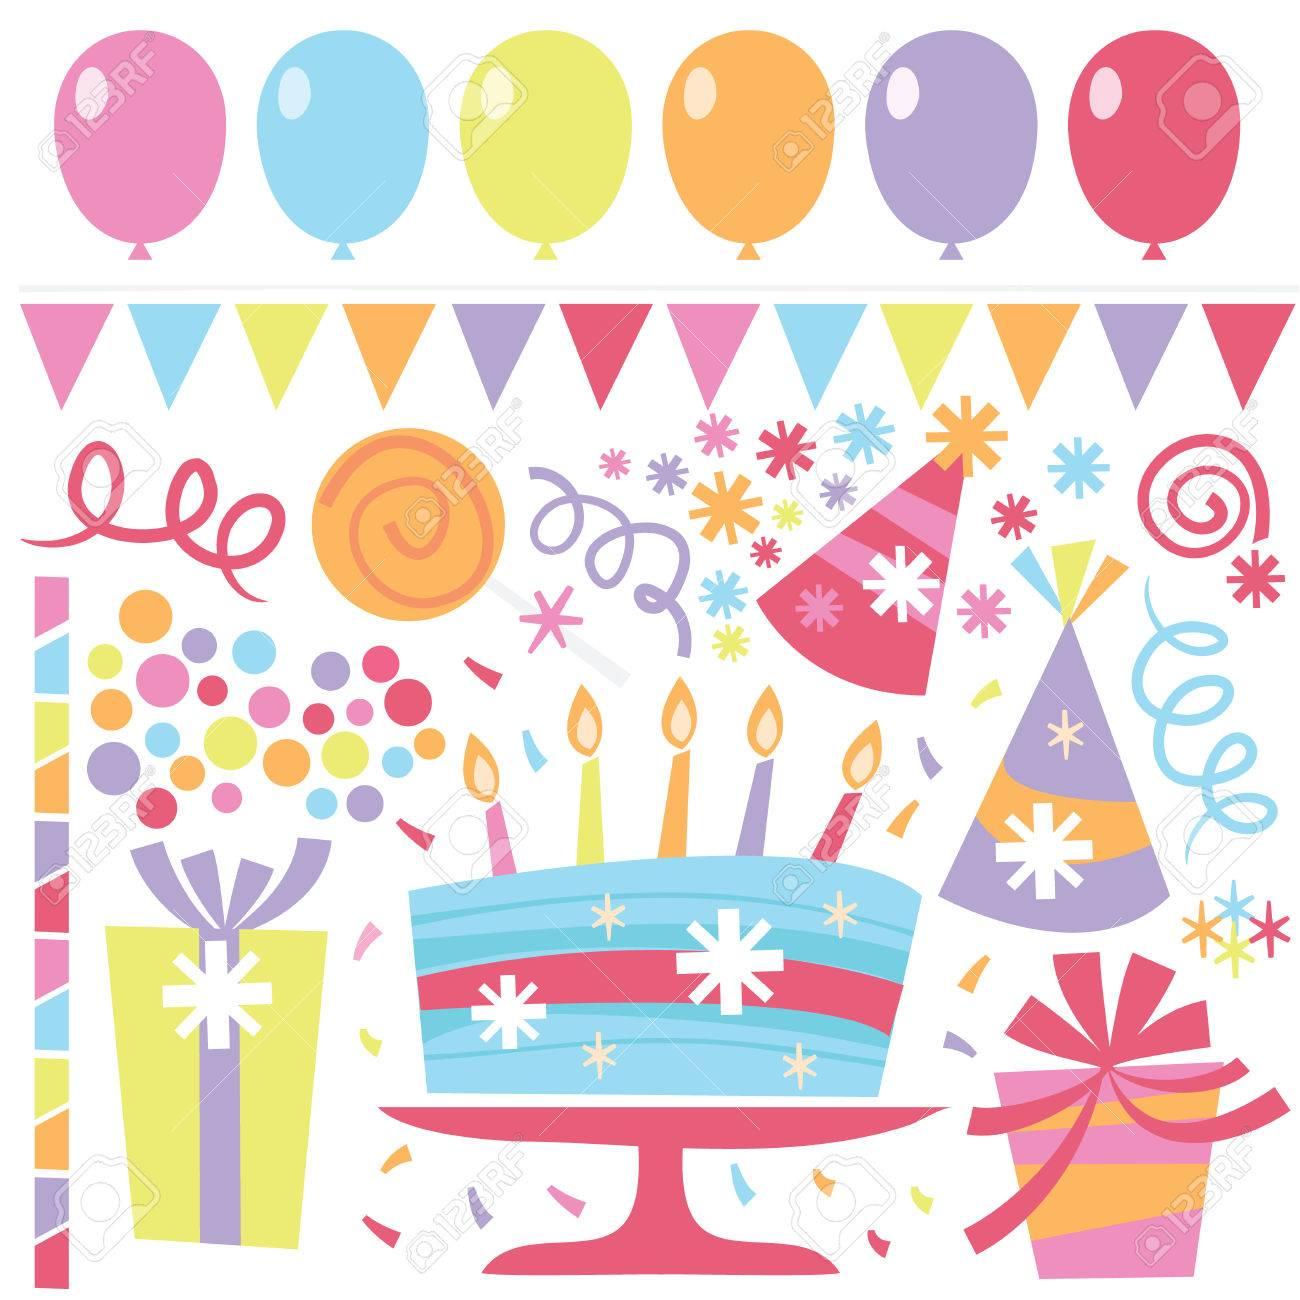 a vector illustration of retro birthday clip arts like balloons